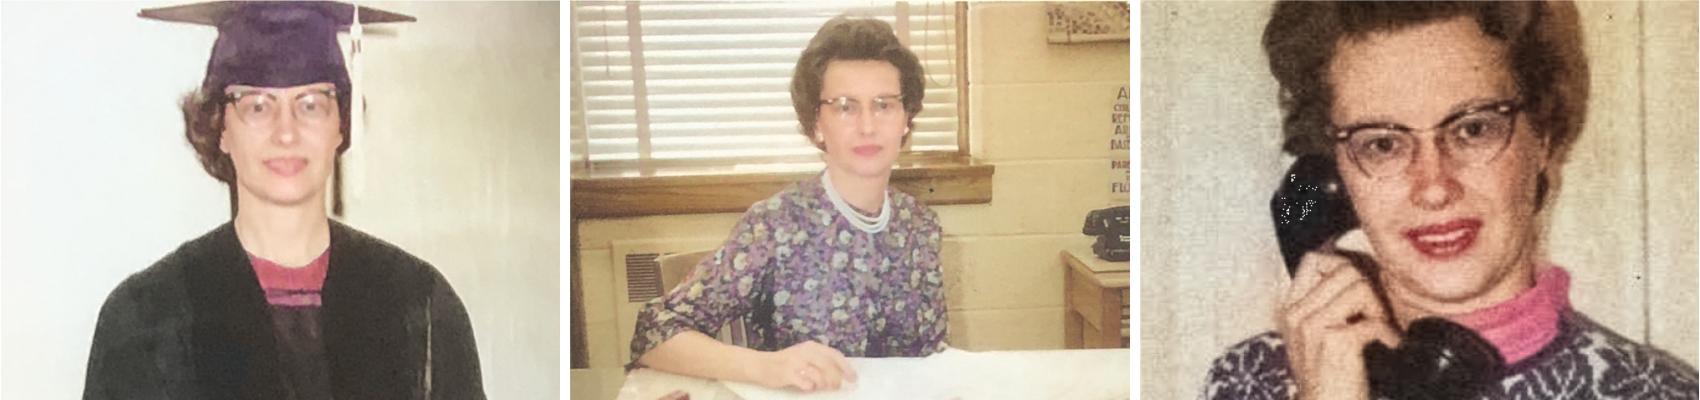 Three photos of Rose Marie Schmidt over her lifetime: graduation, career, holding a phone